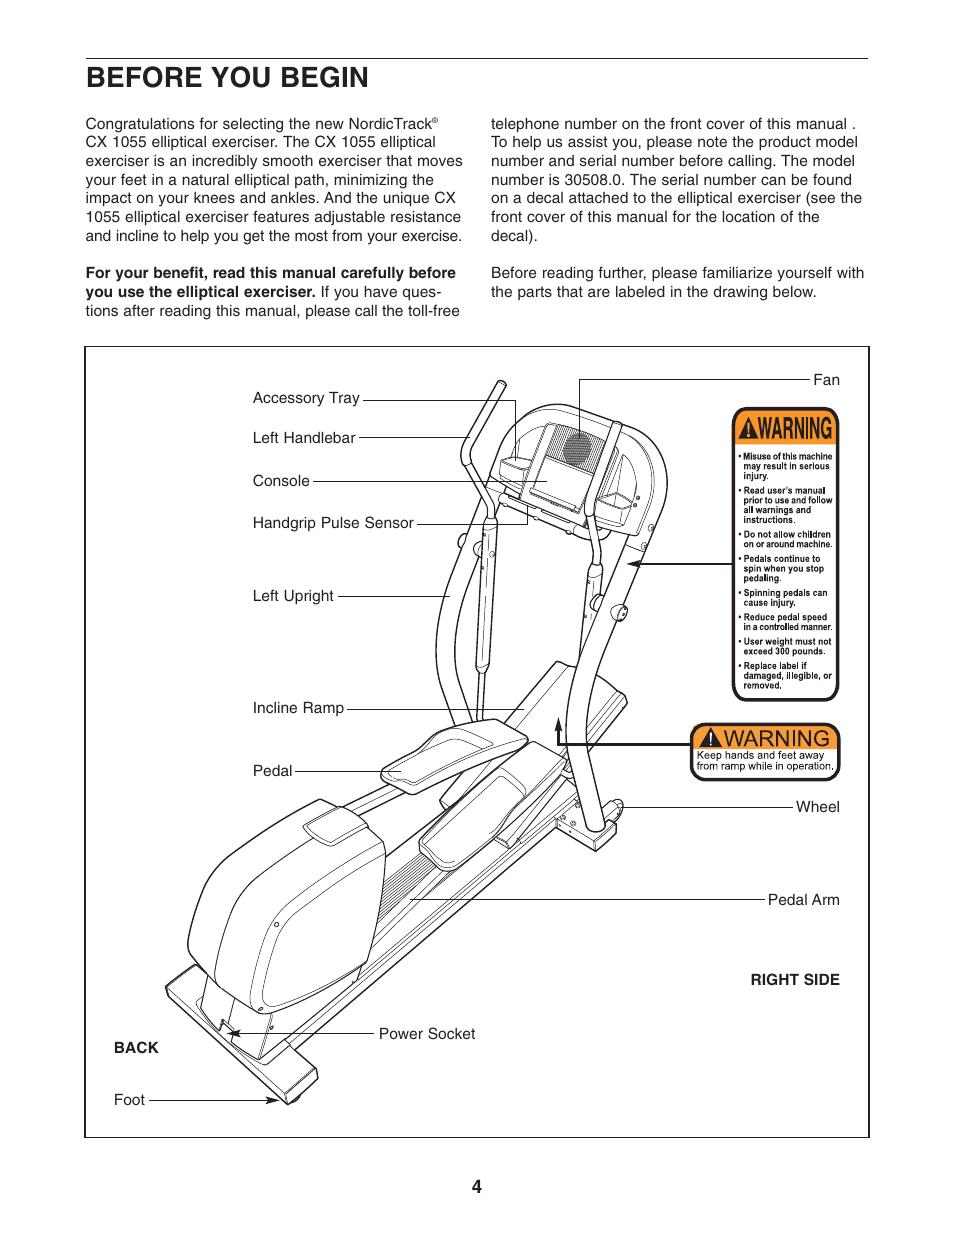 nordictrack cx 1055 manual